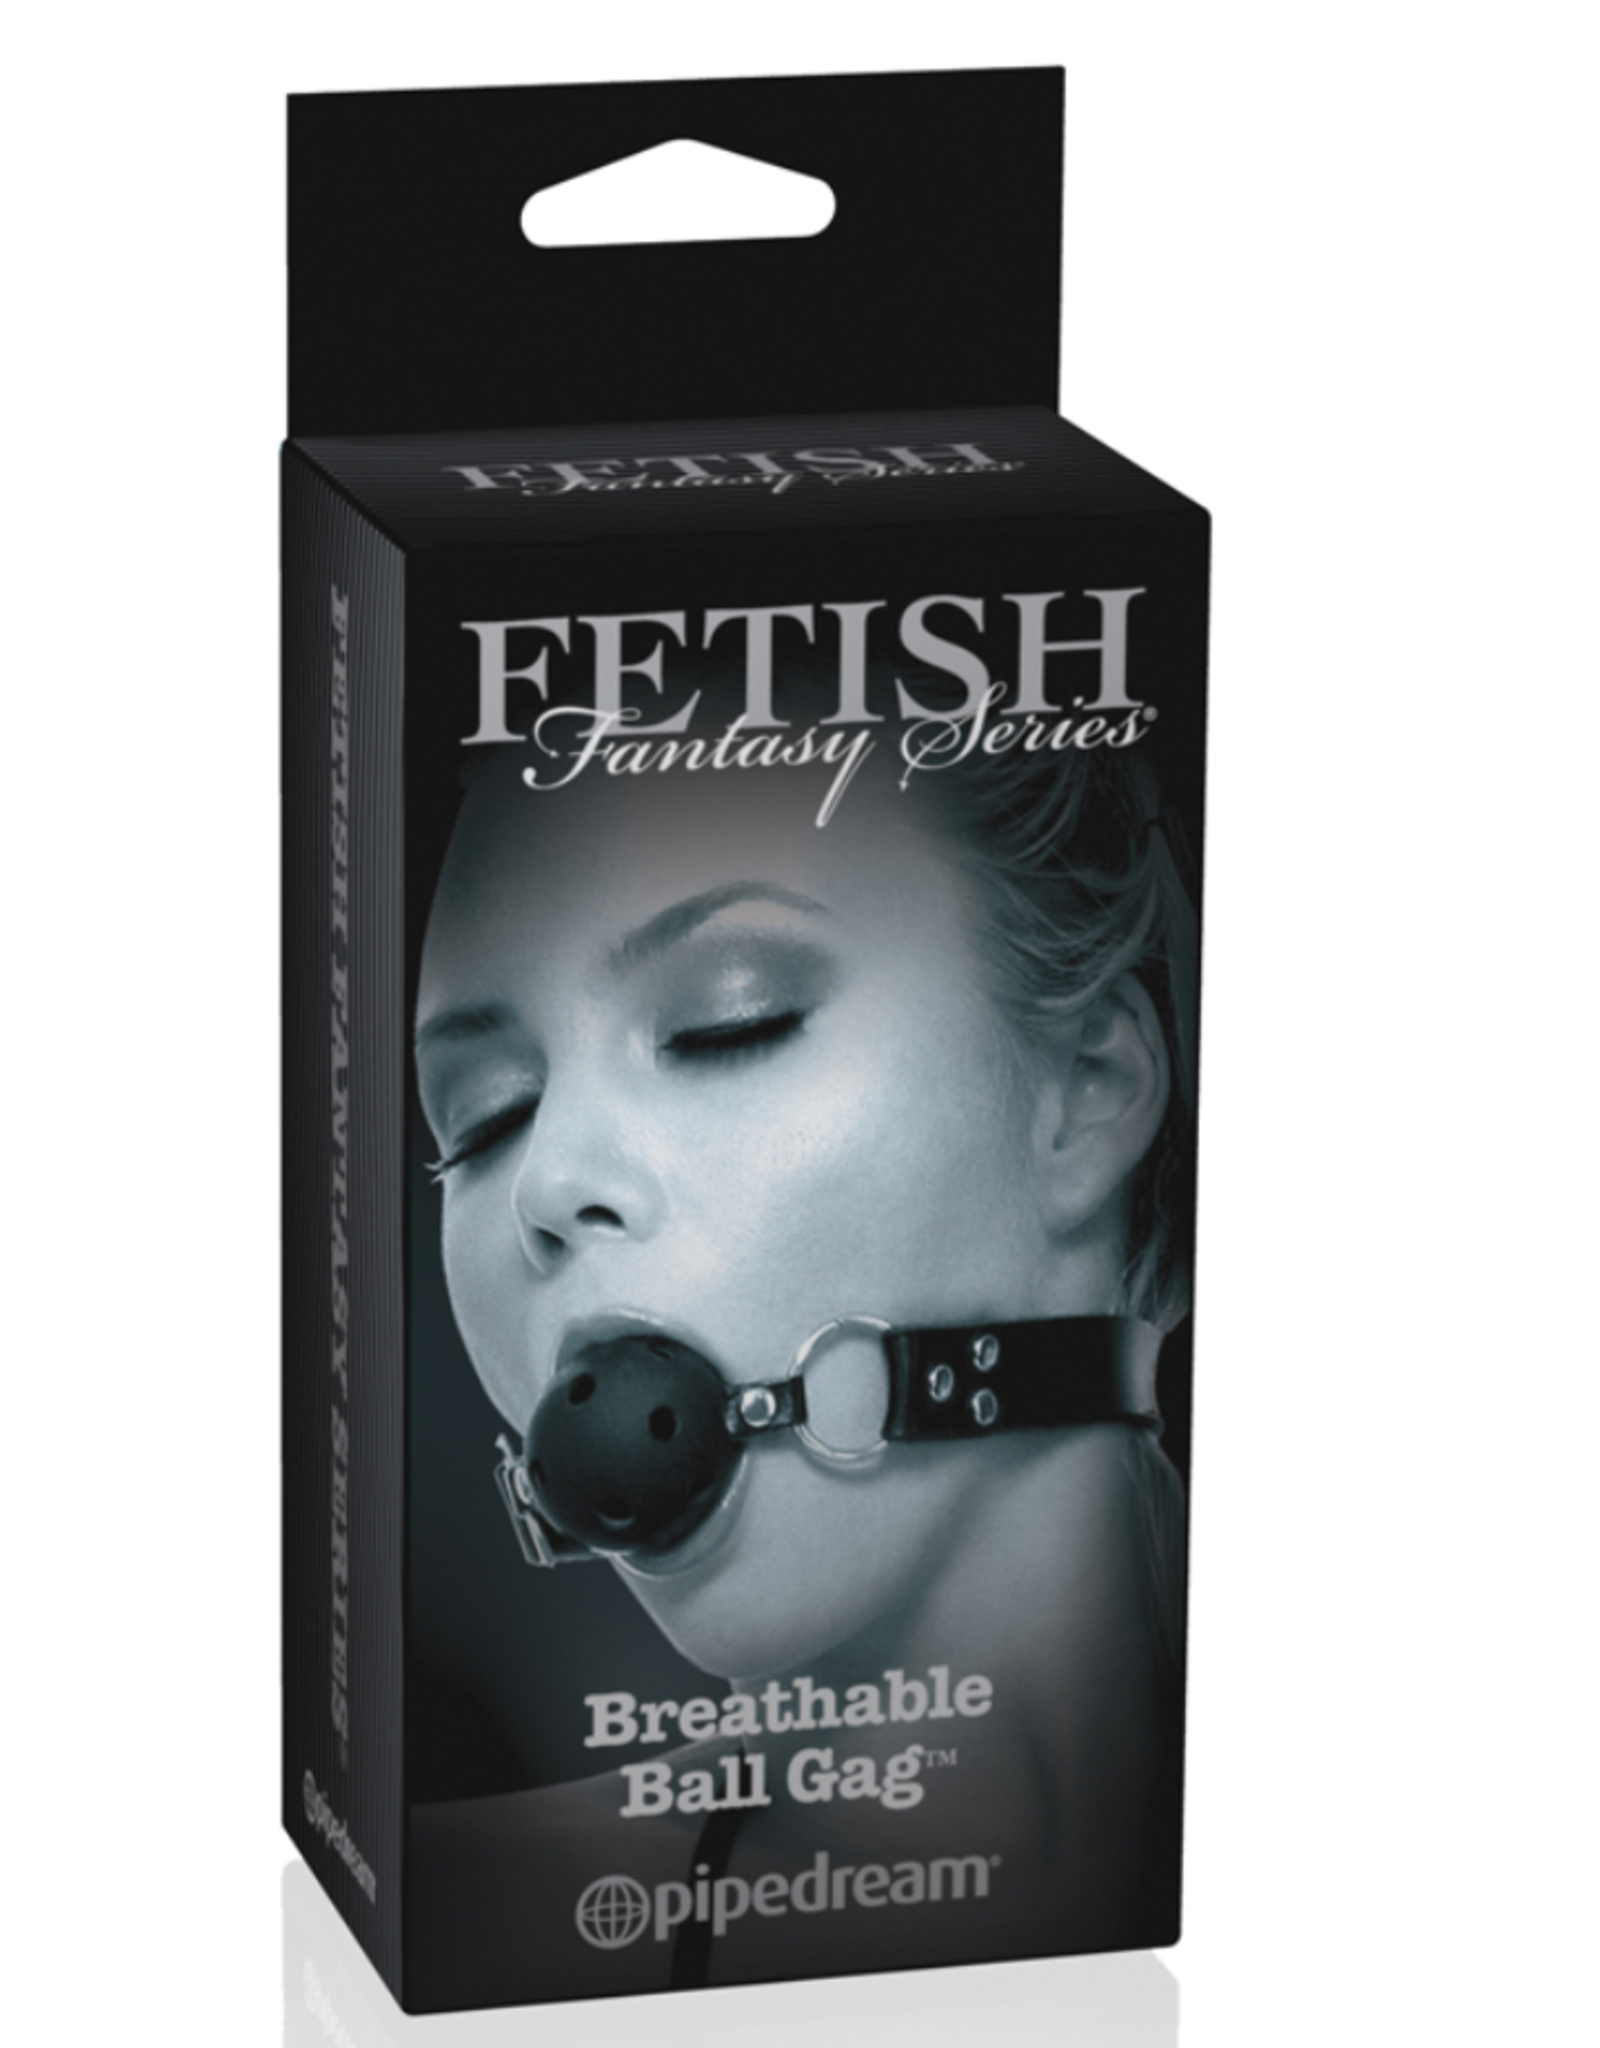 Fetish Fantasy Limited Edition Breathable Ball Gag